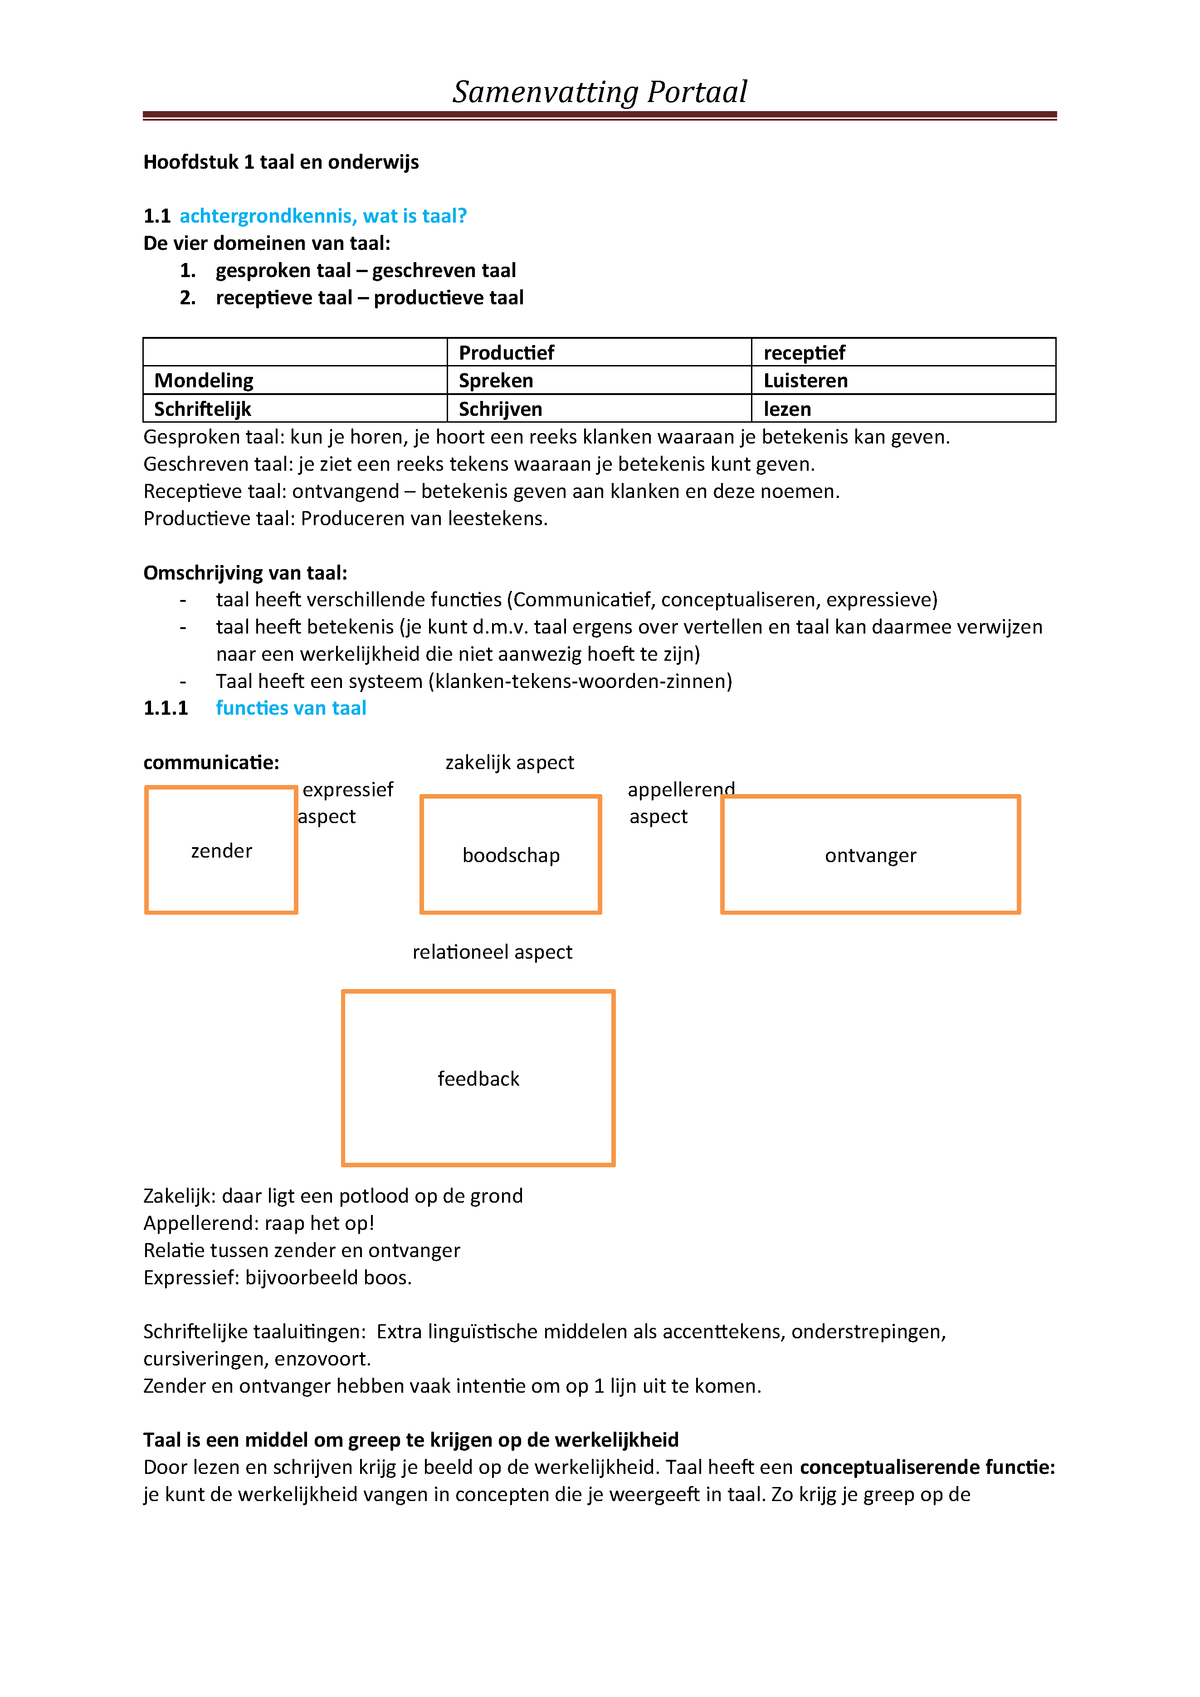 Synoniemen.net